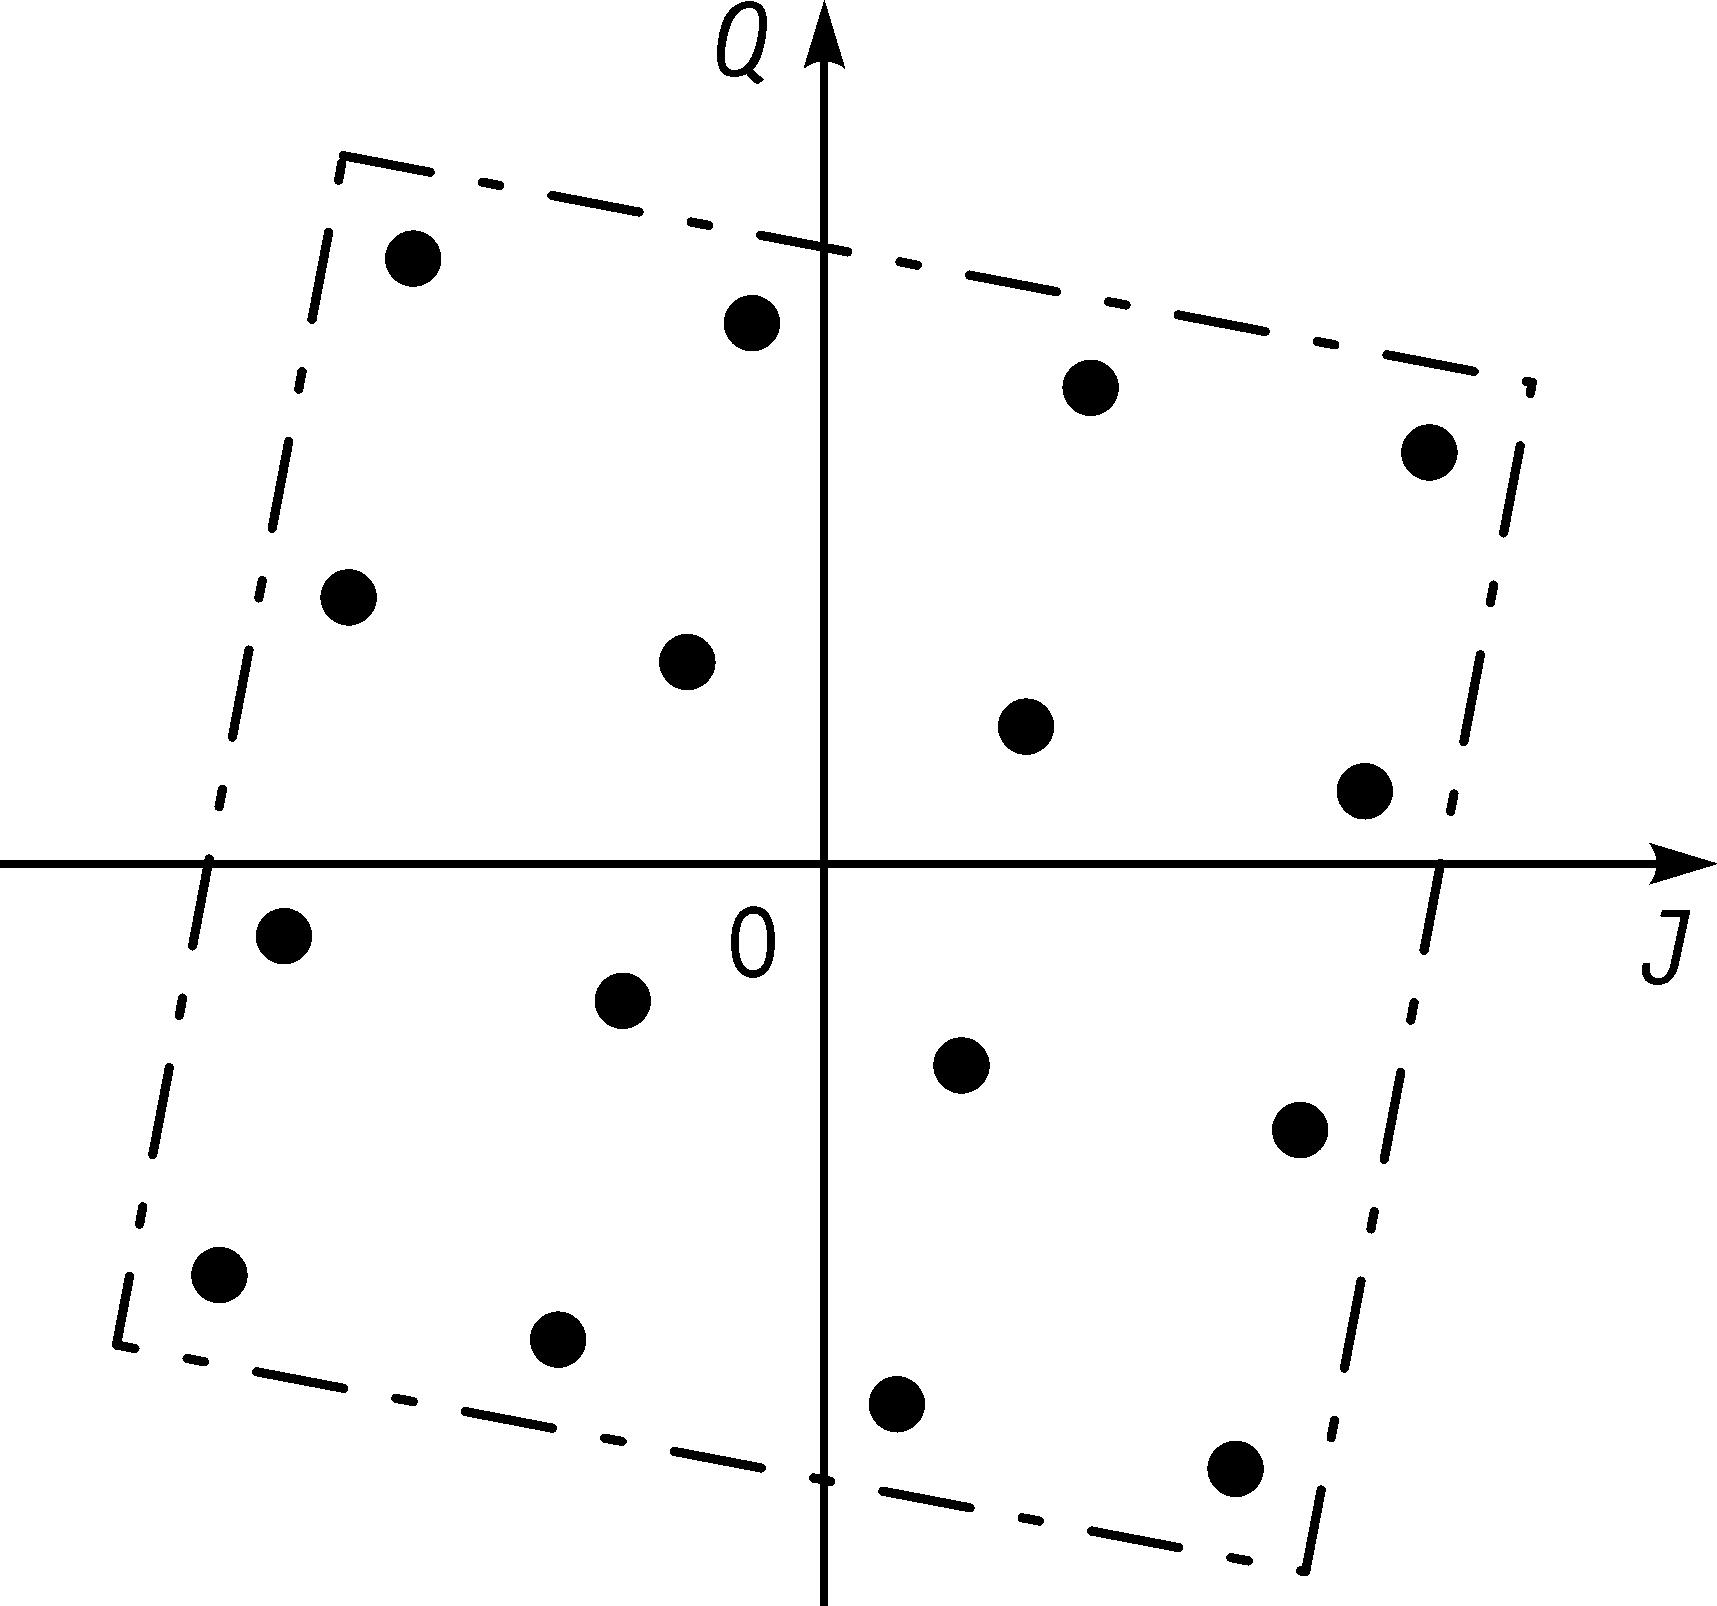 схема передача цифрового сигнала по радиоканалу